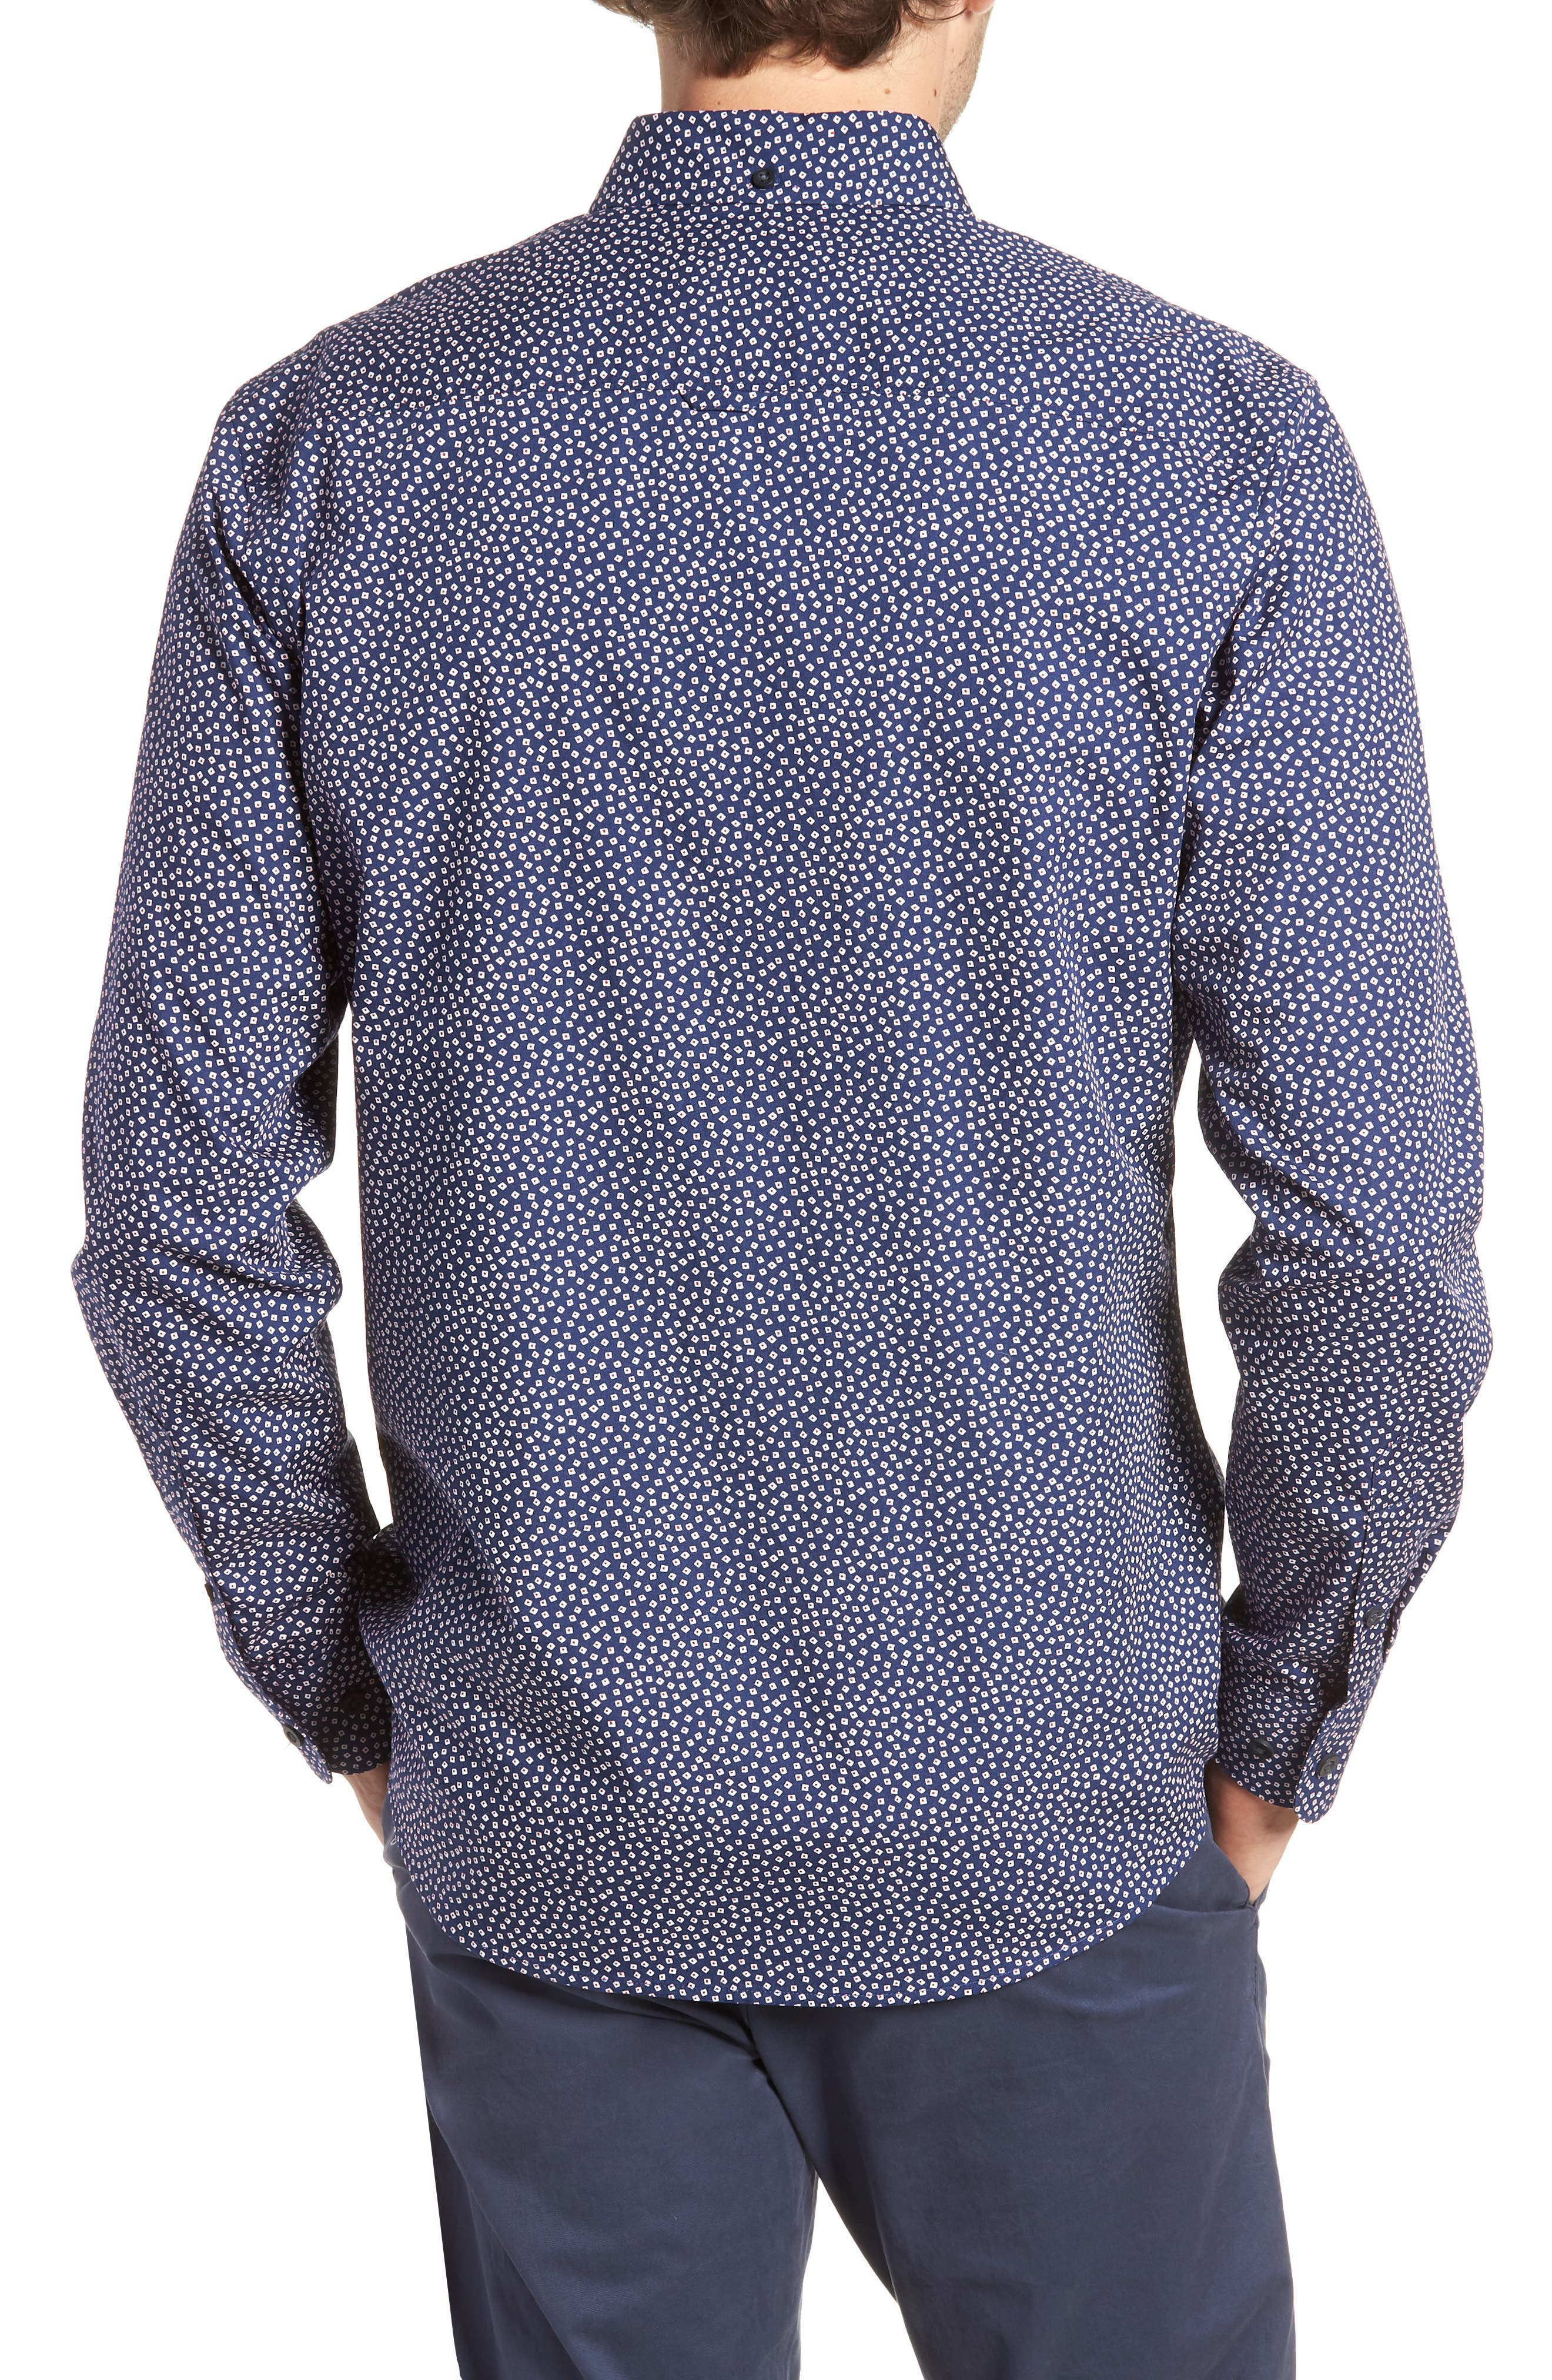 Ivy Trim Fit Print Sport Shirt,                             Alternate thumbnail 3, color,                             Navy Iris Tossed Squares